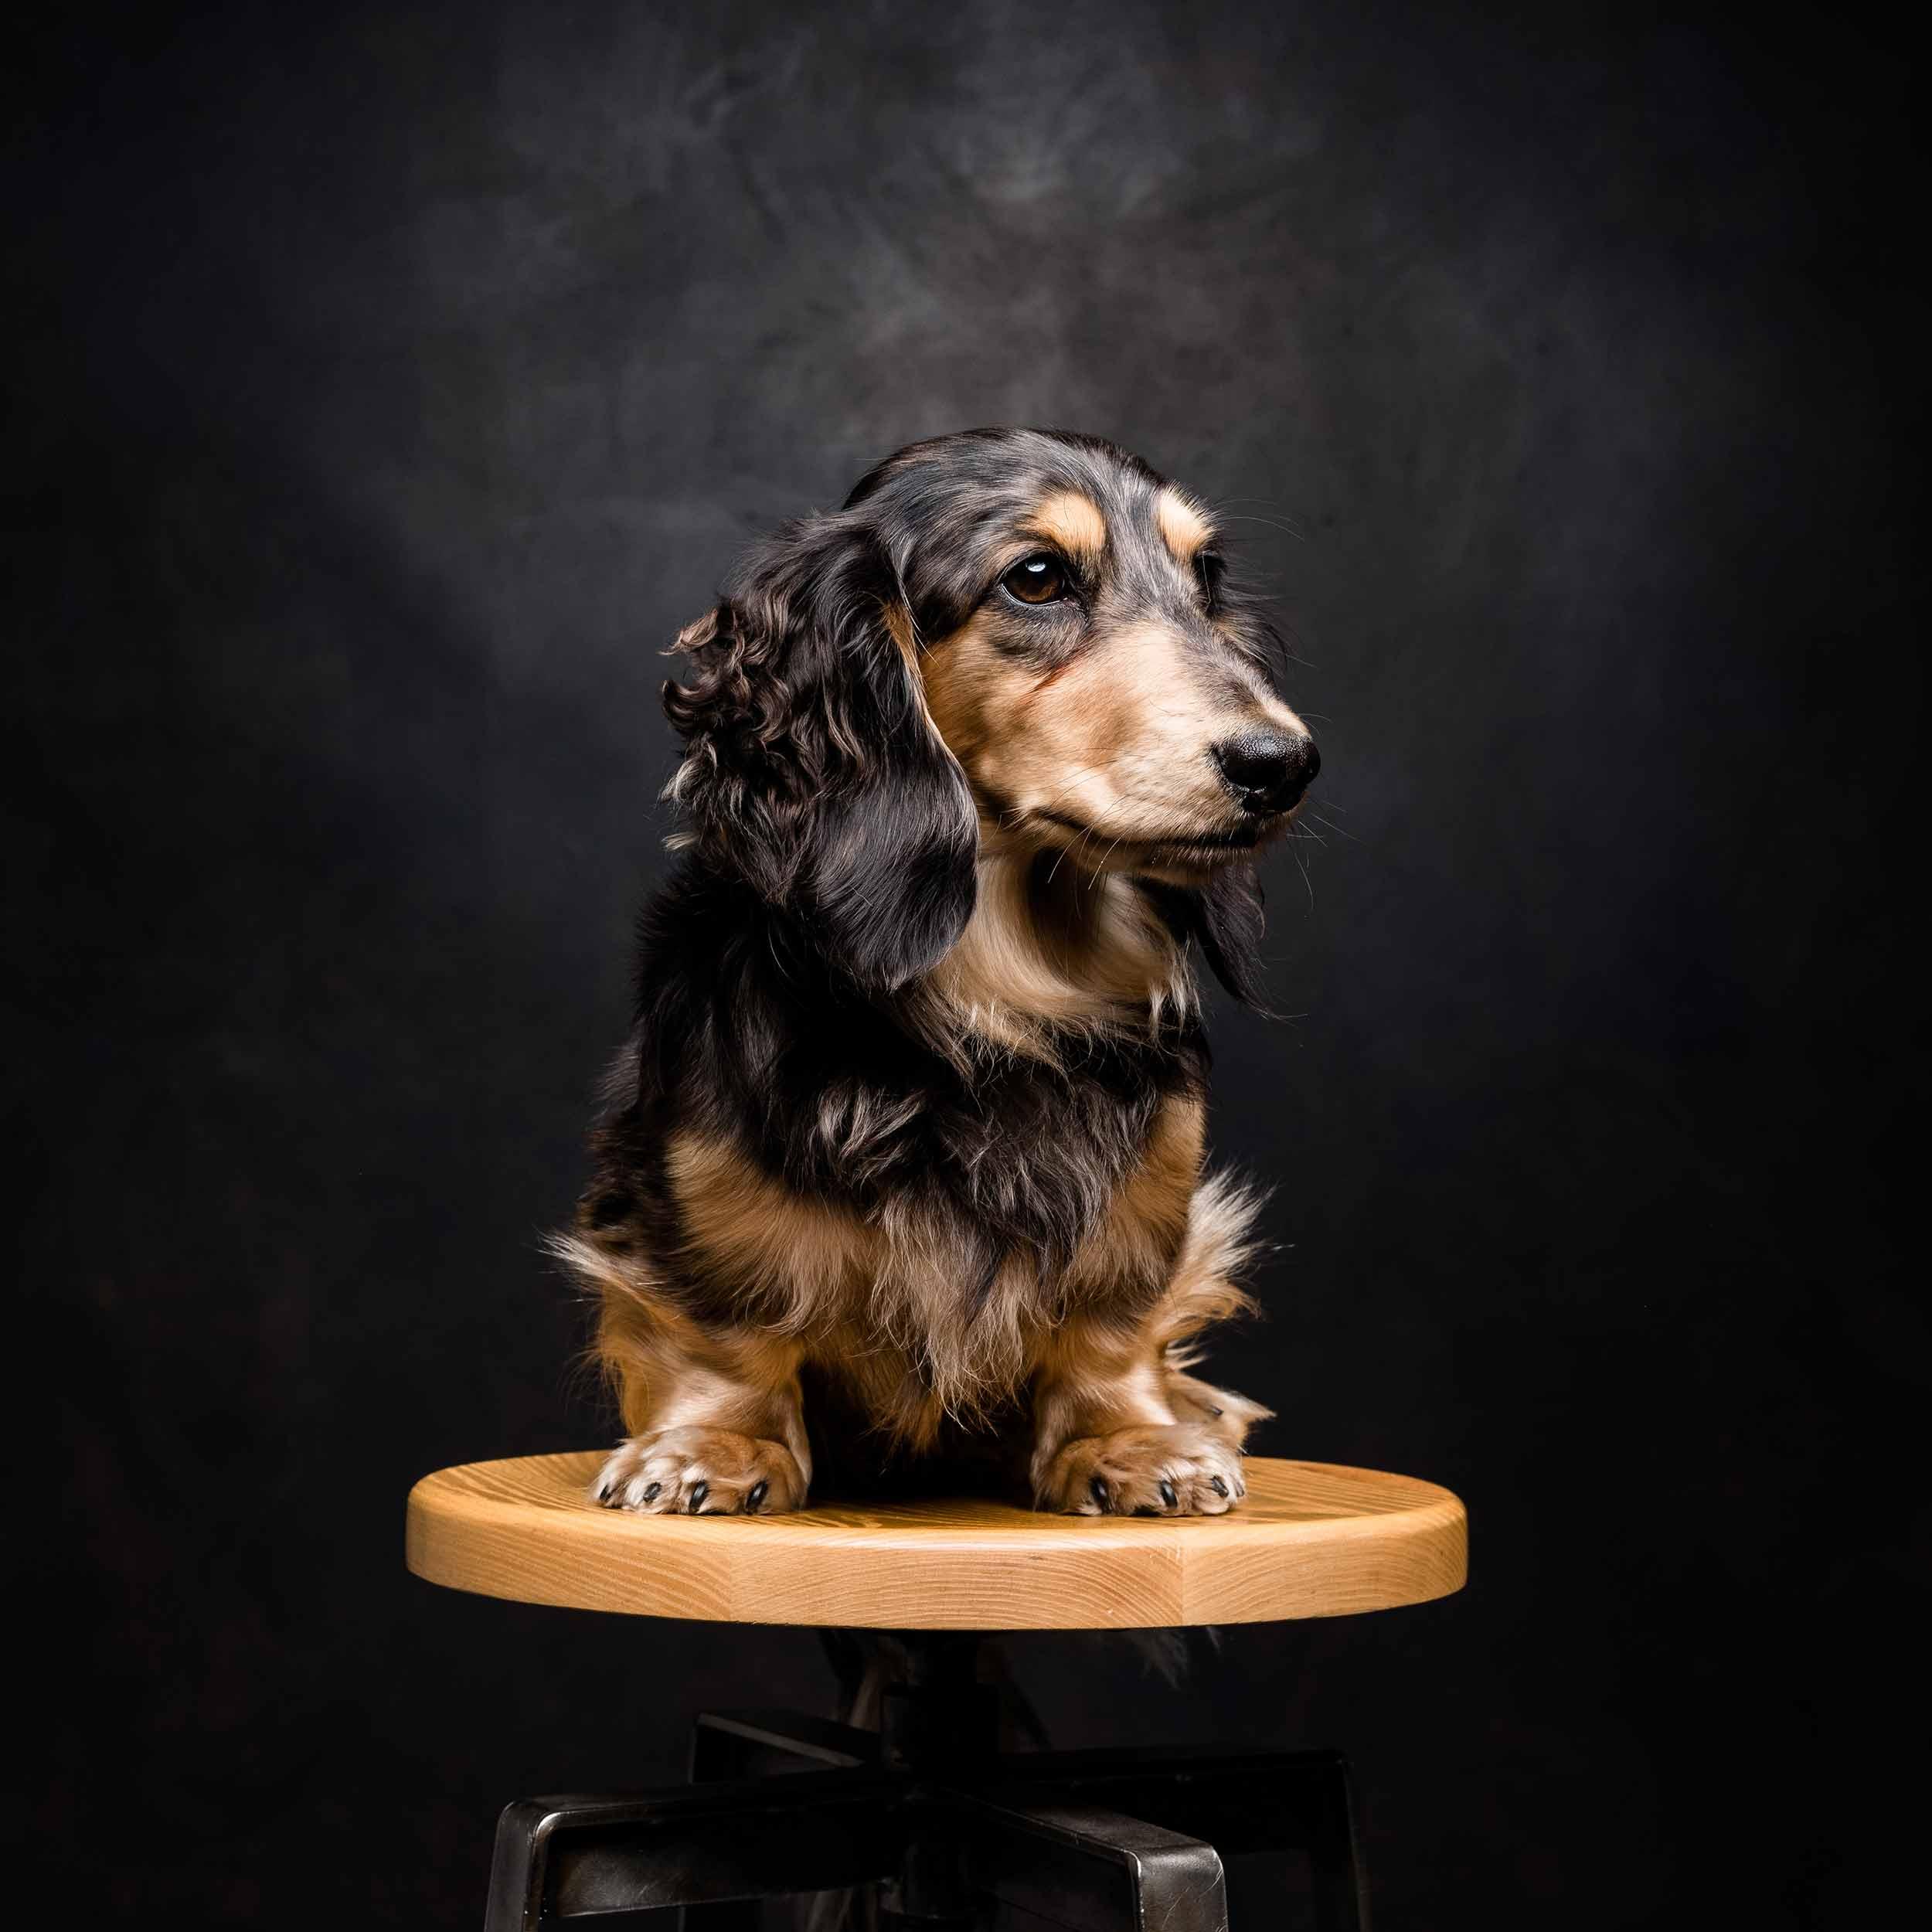 12.01---Dogs-Life_0001_8447.jpg